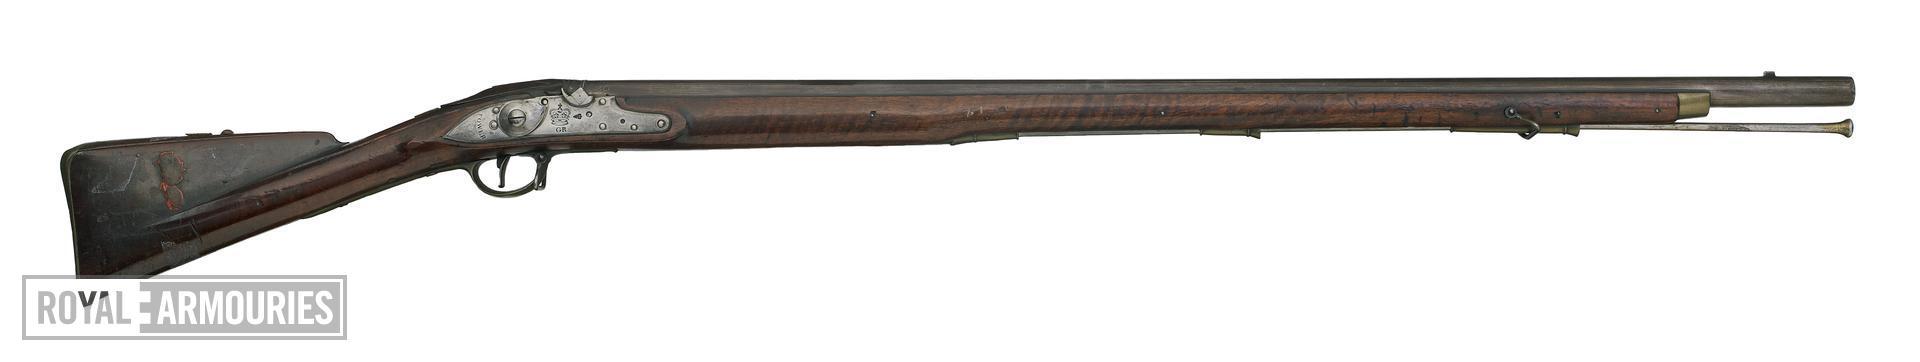 Percussion muzzle-loading military musket - India Pattern, sealed pattern